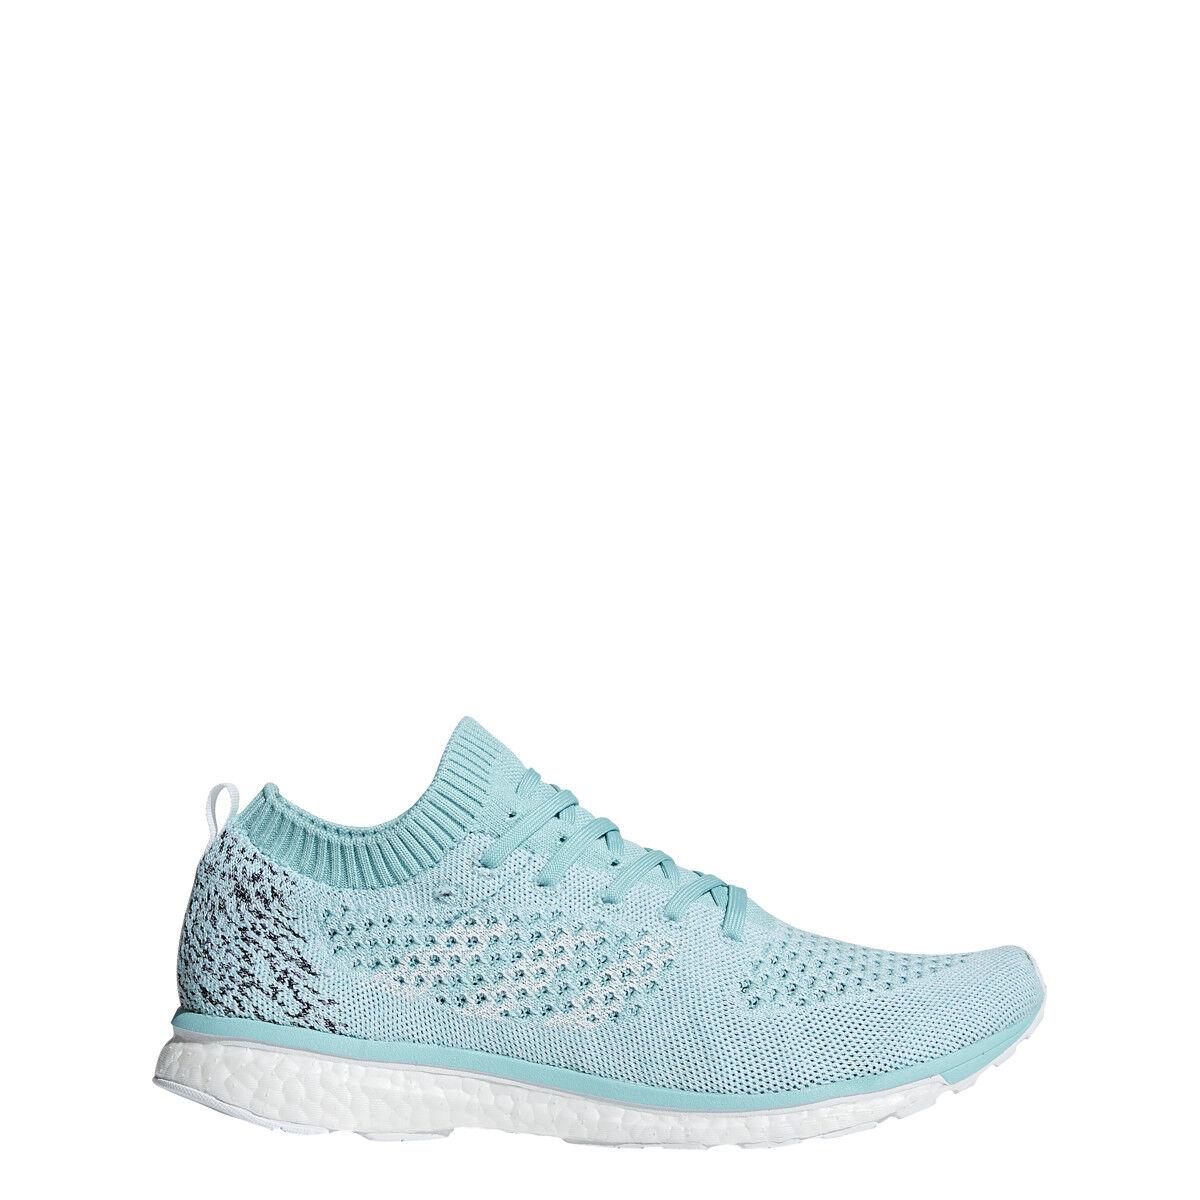 Men's adidas Adizero Prime LTD bluee Spirit Footwear White Carbon AQ0201 BWG